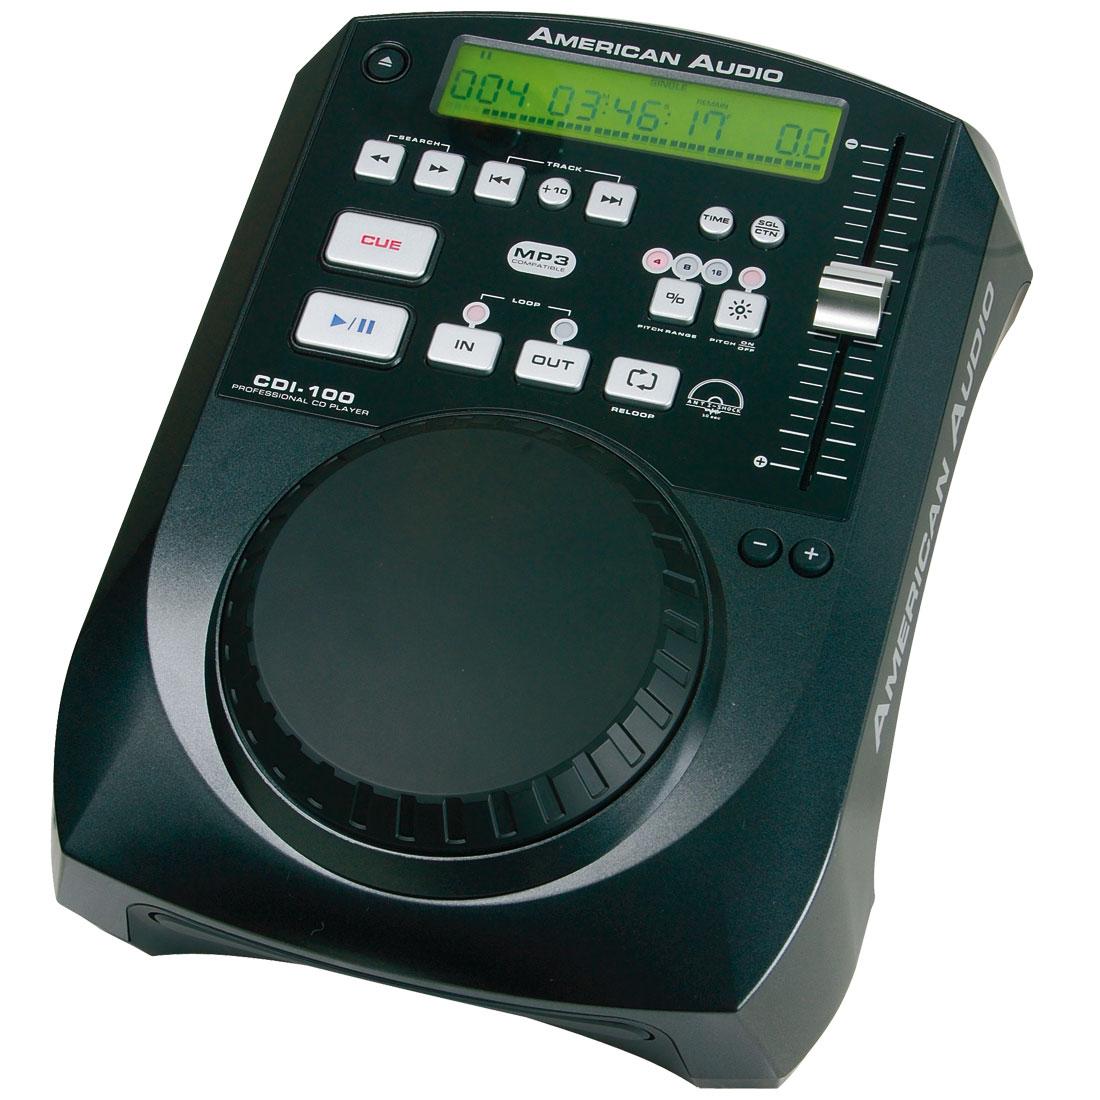 CDI 100 MP3